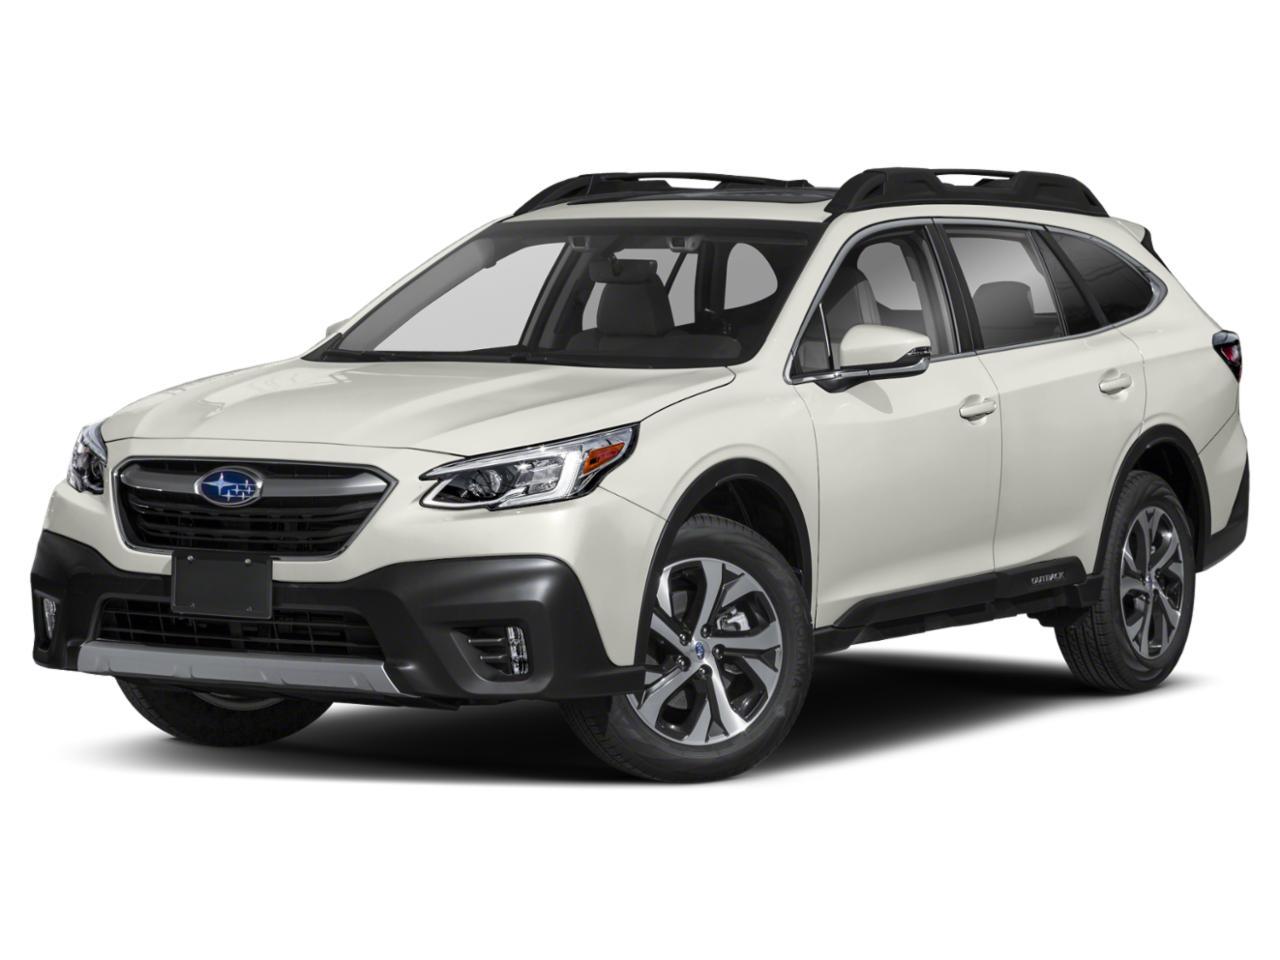 2022 Subaru Outback Vehicle Photo in Green Bay, WI 54304